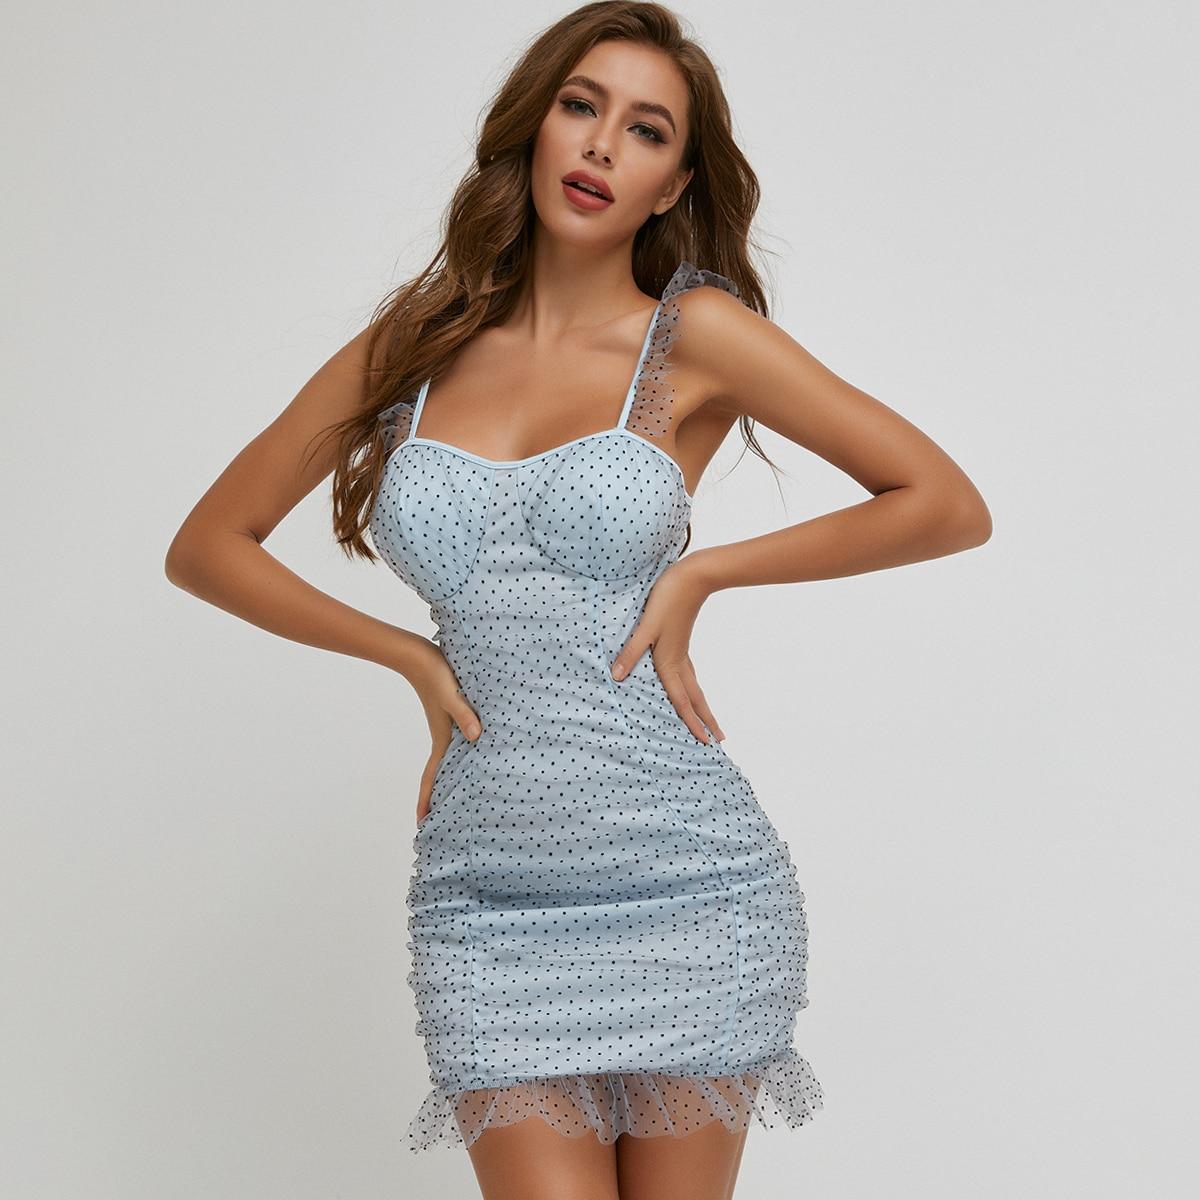 Ruched Bust Ruffle Trim Polka Dot Mesh Dress